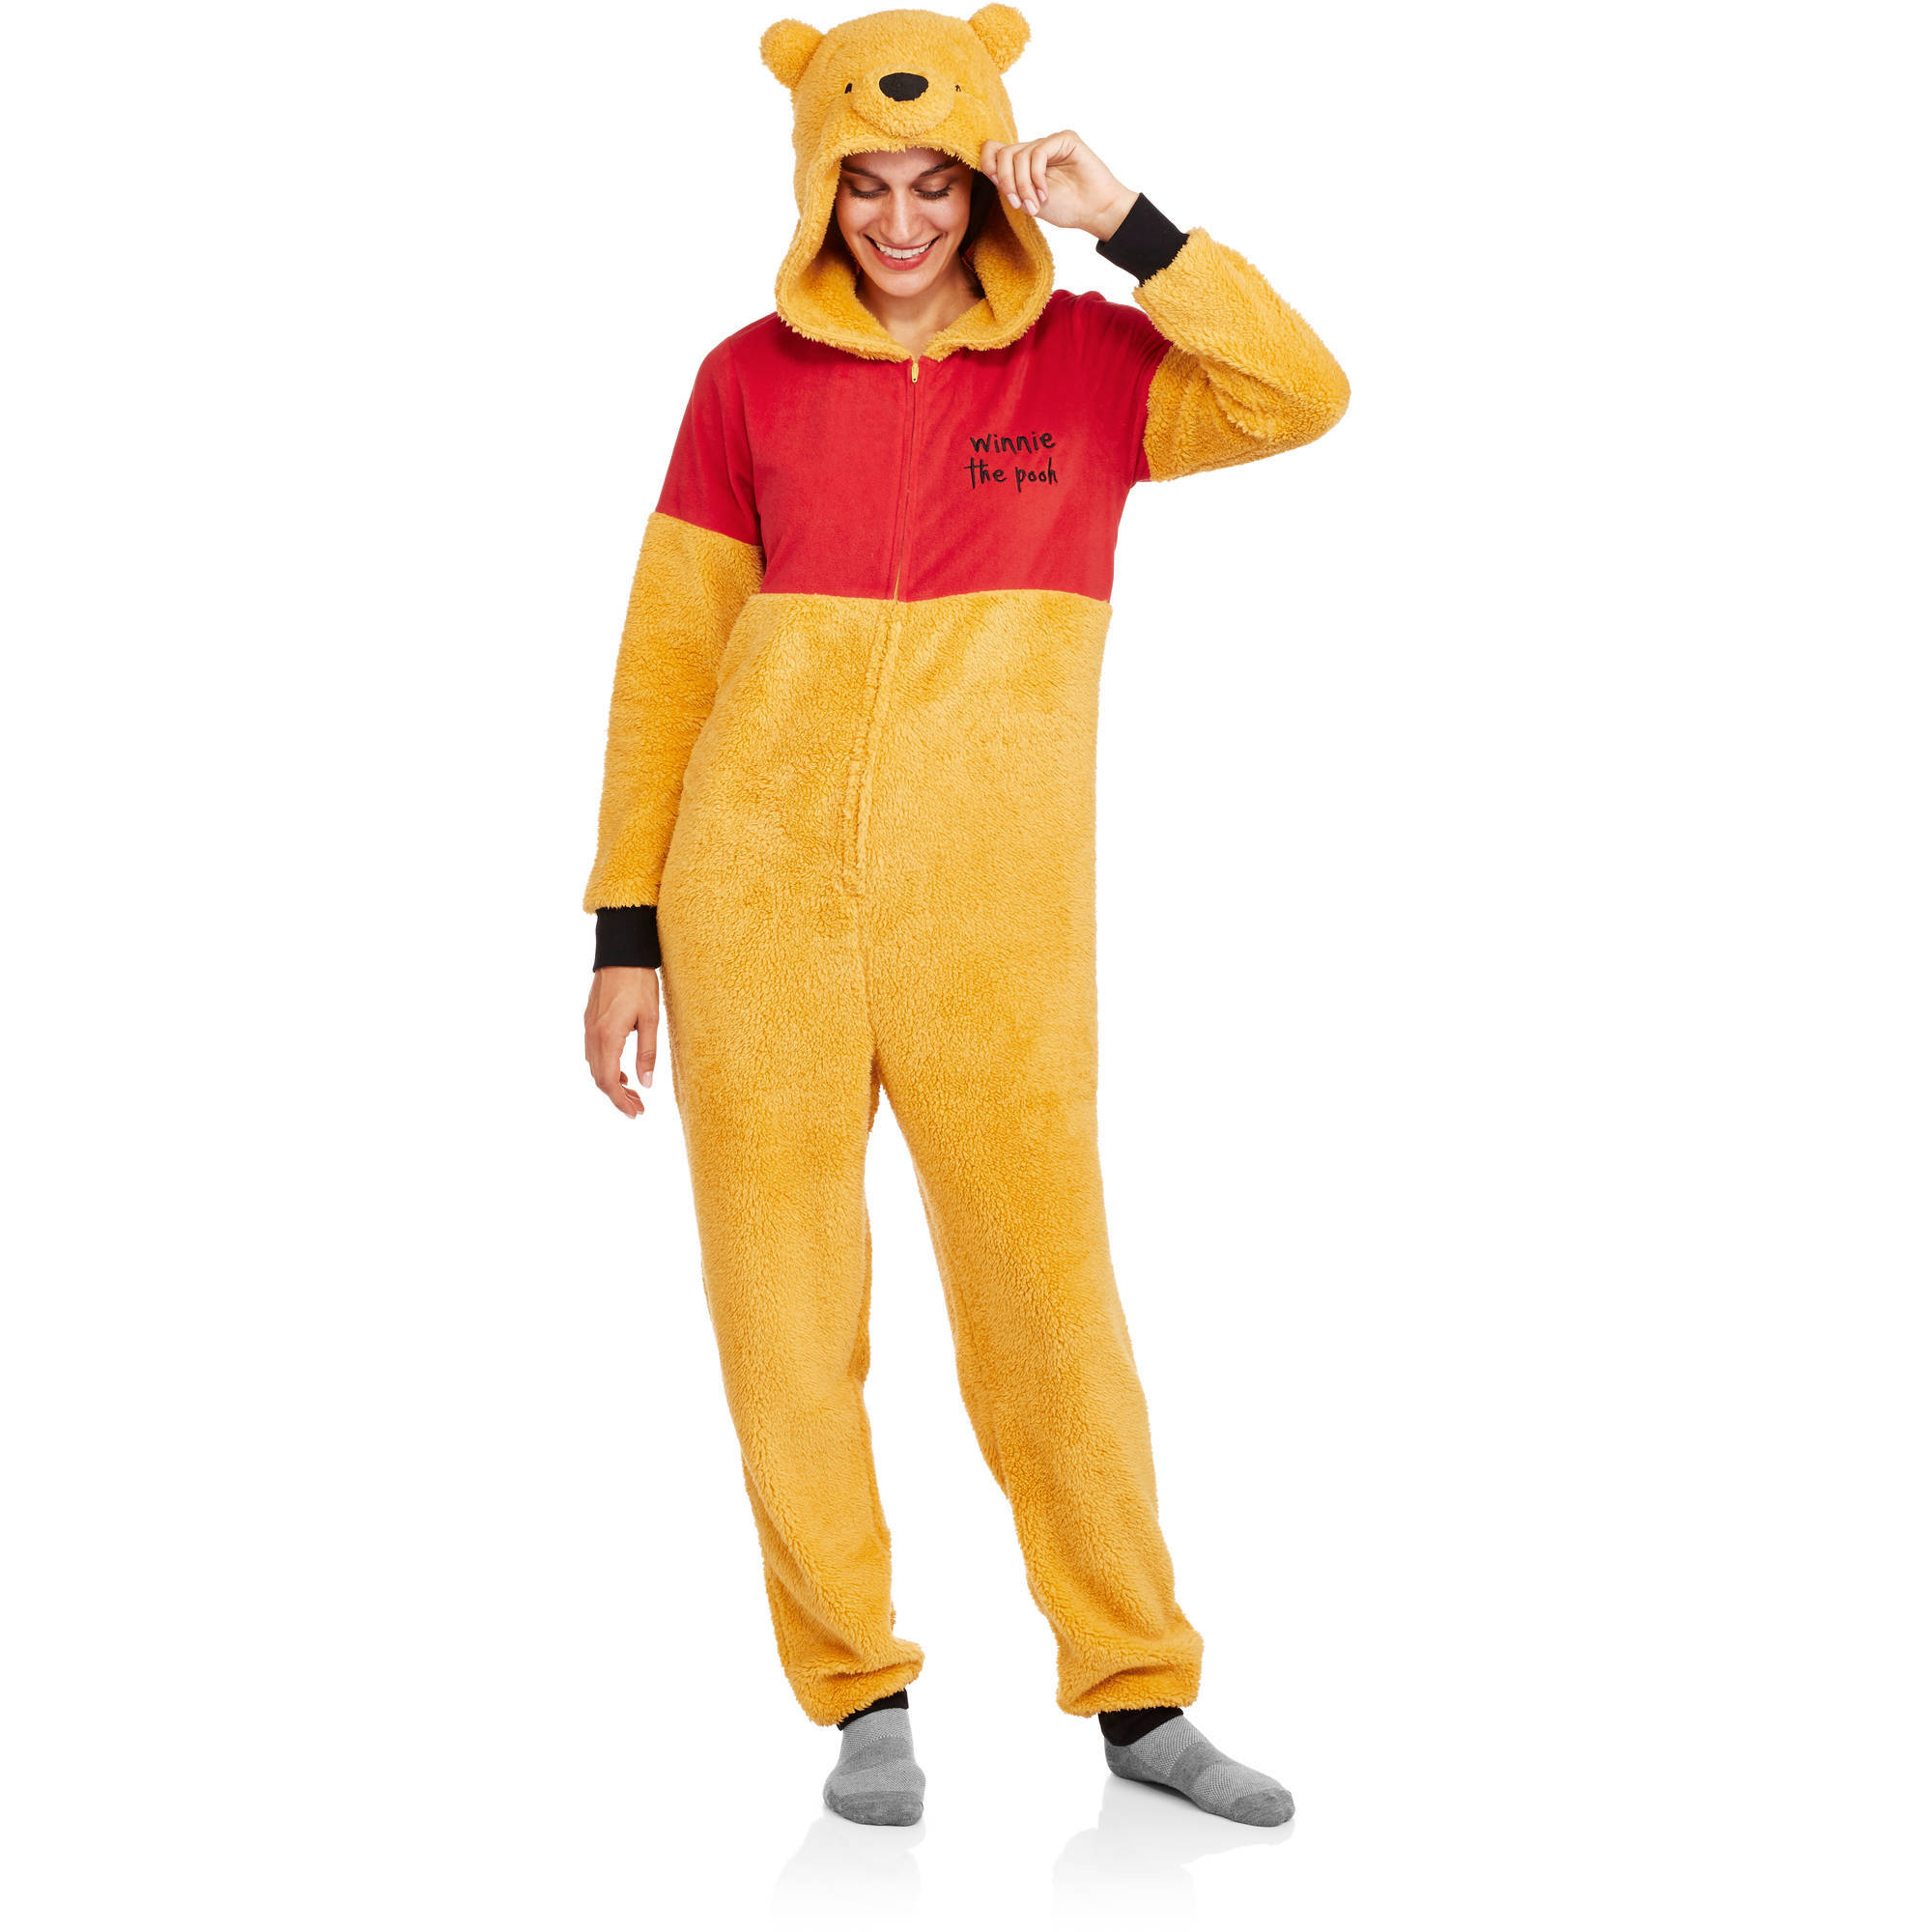 Winnie the Pooh Women's and Women's Plus License Sleepwear Adult Onesie Costume Union Suit Pajama (Sizes XS-3X)